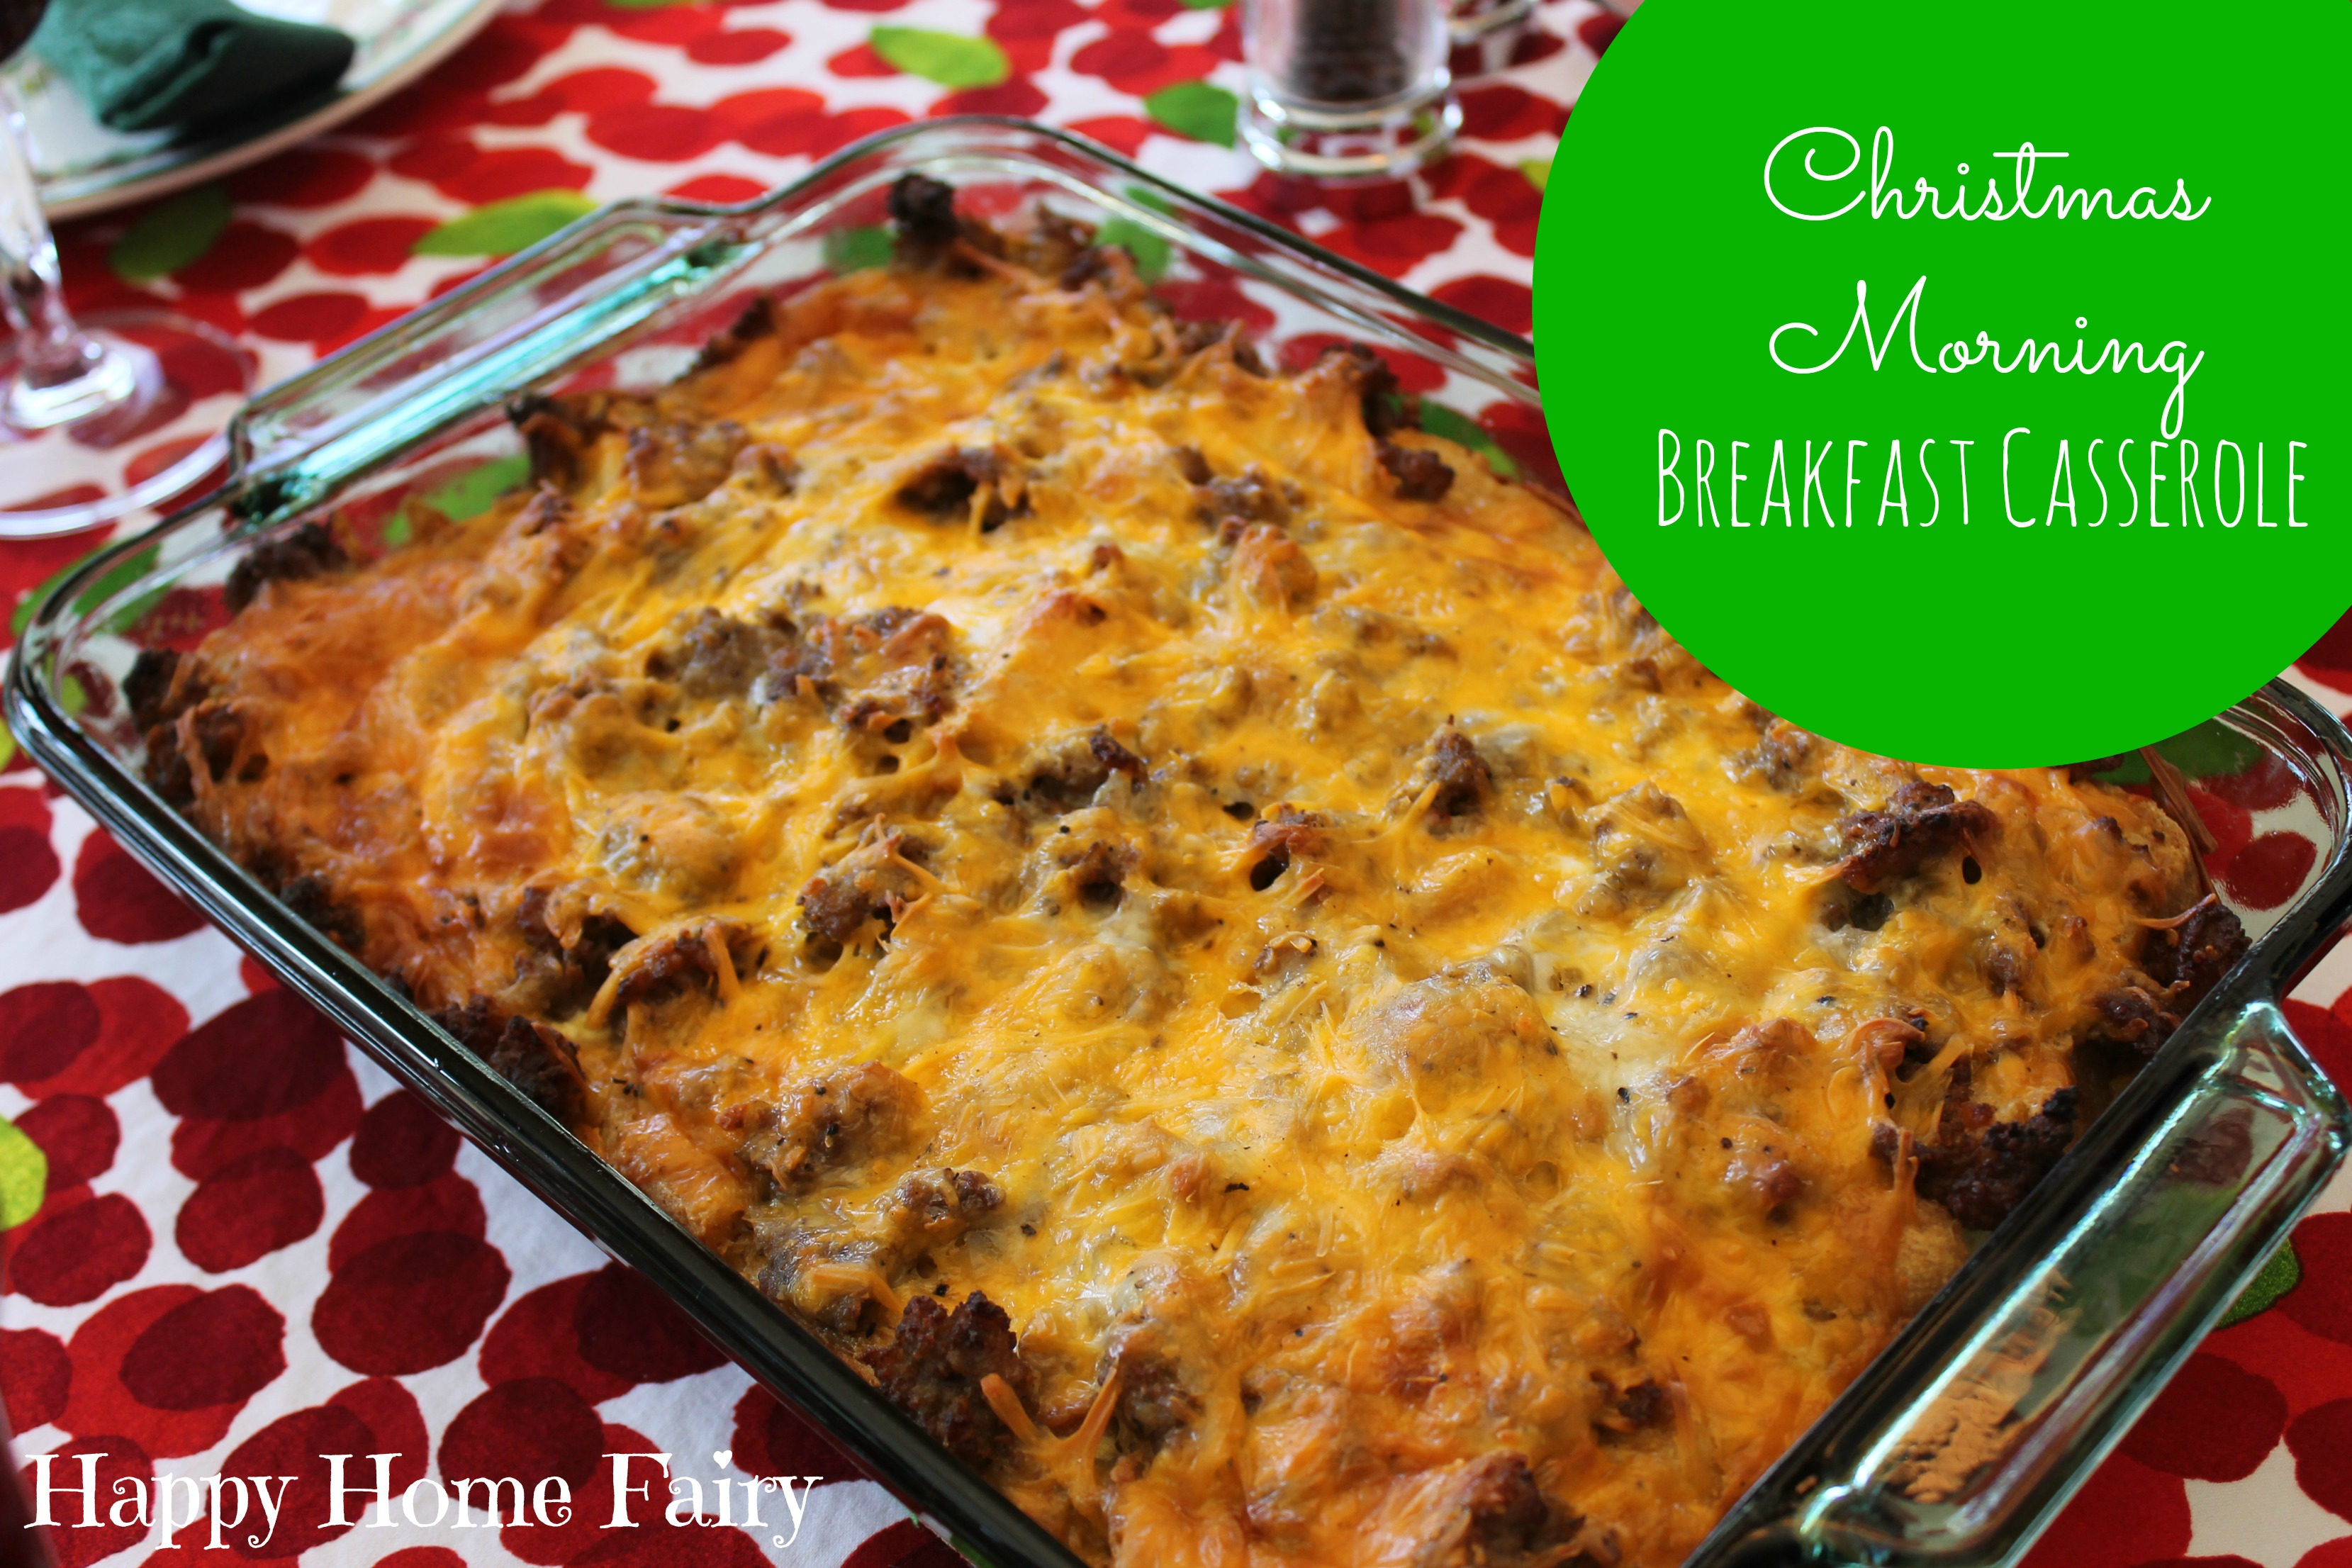 Christmas Brunch Casserole Recipes — Dishmaps